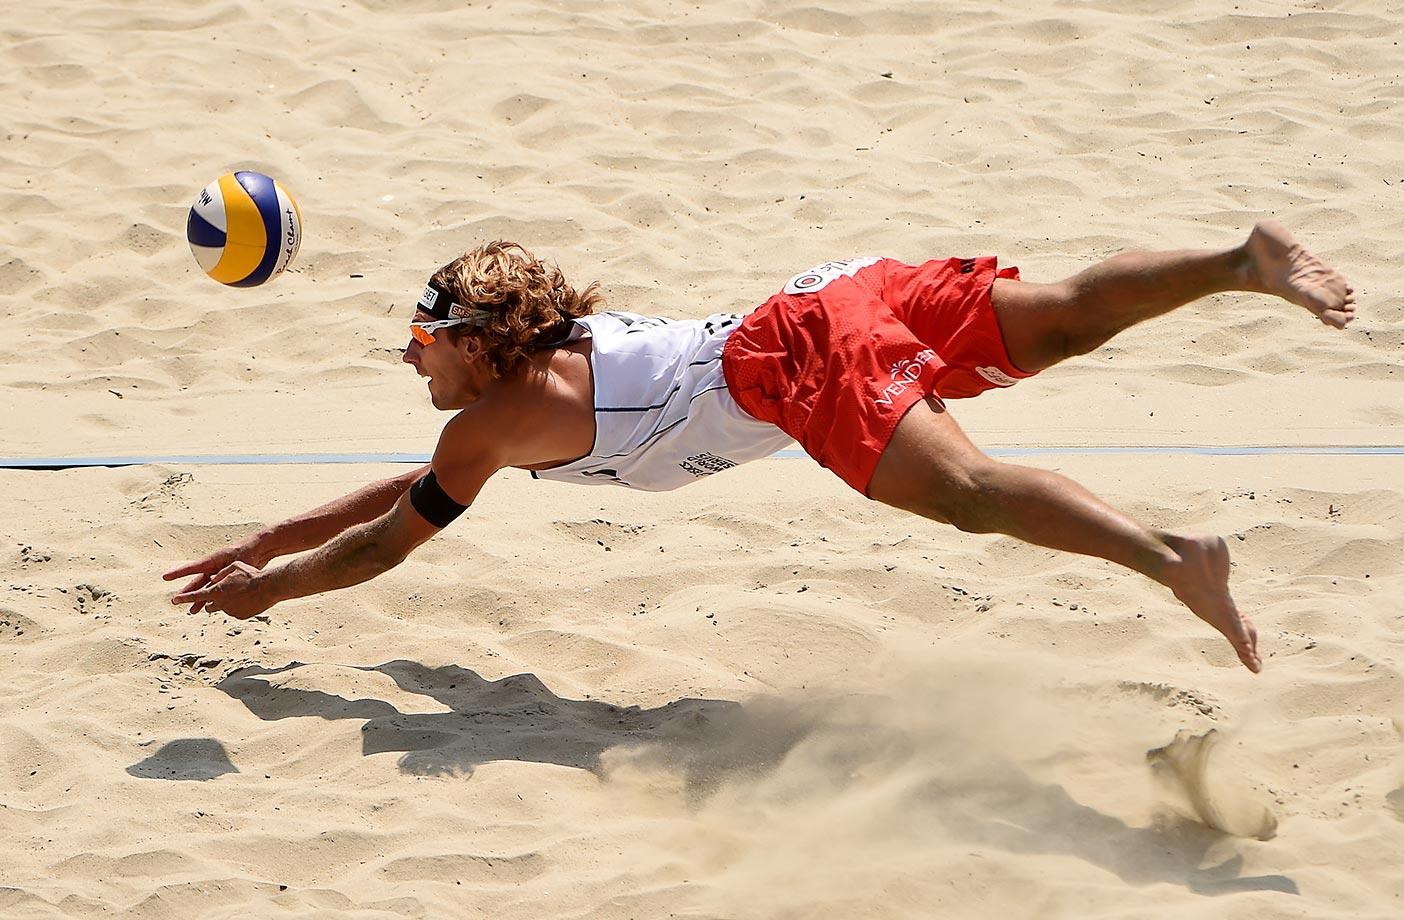 ASICS World Series of Beach Volleyball.